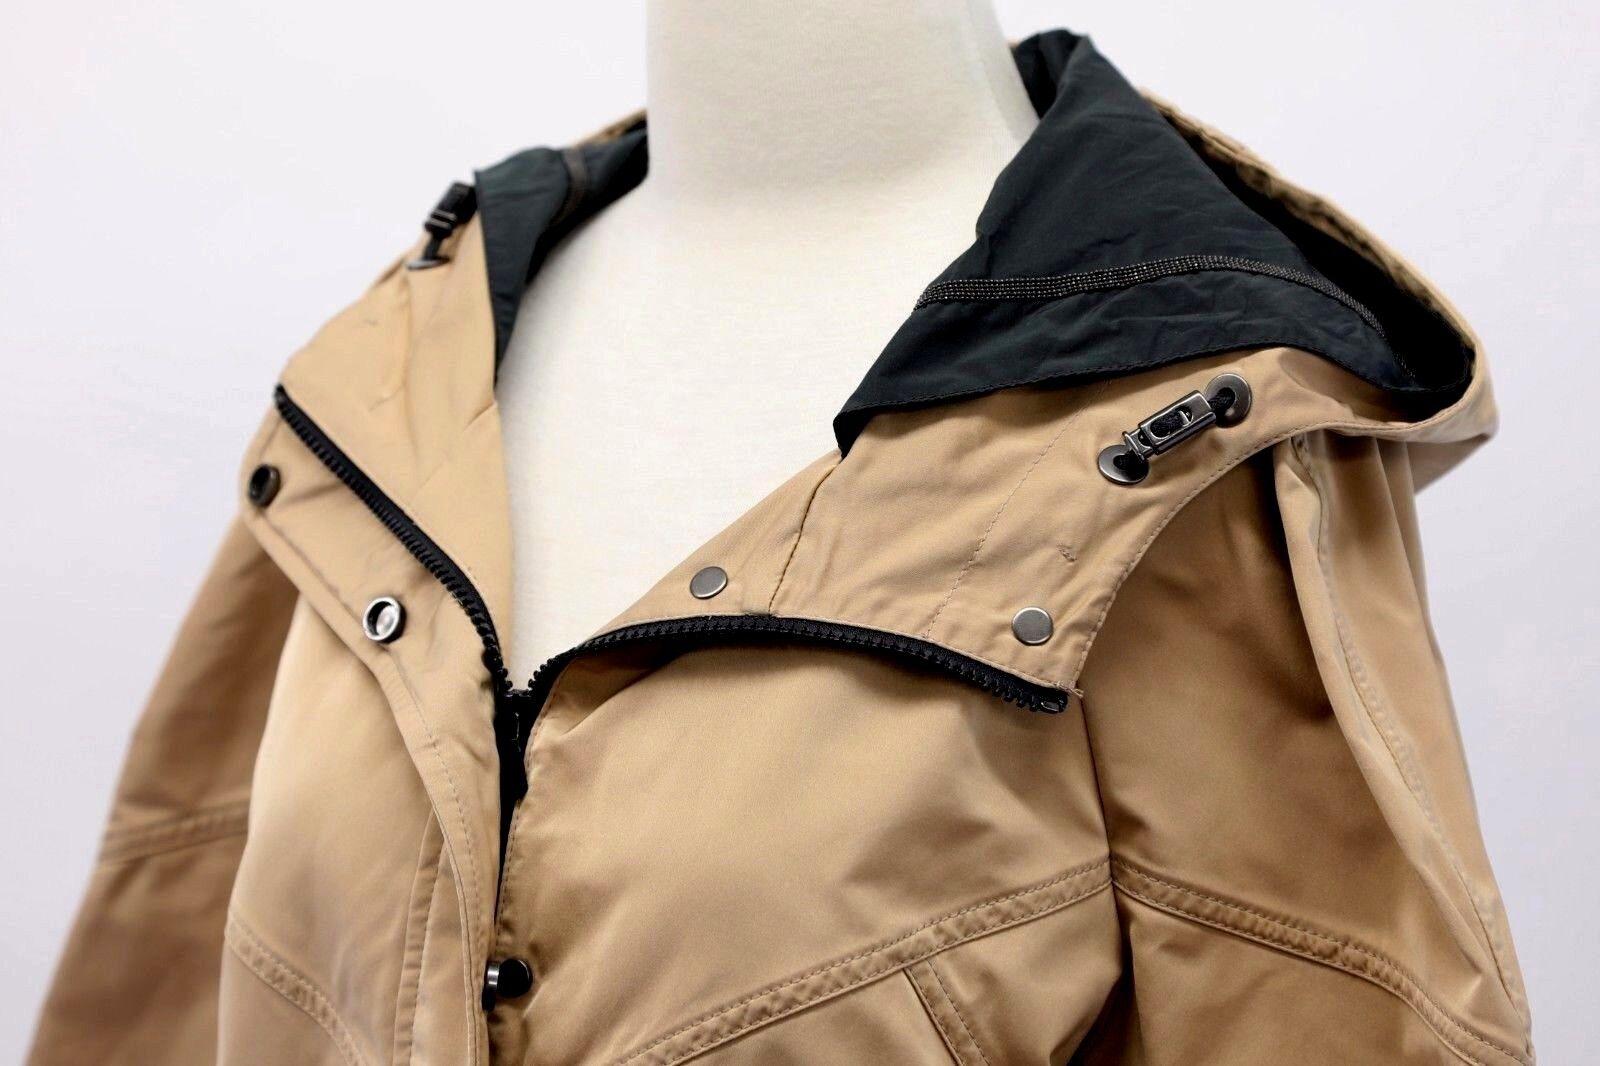 NWT 3695 Brunello Cucinelli Cucinelli Cucinelli Silk Satin Beaded Hooded Overcoat W Logo Detail A186 5b2b4e